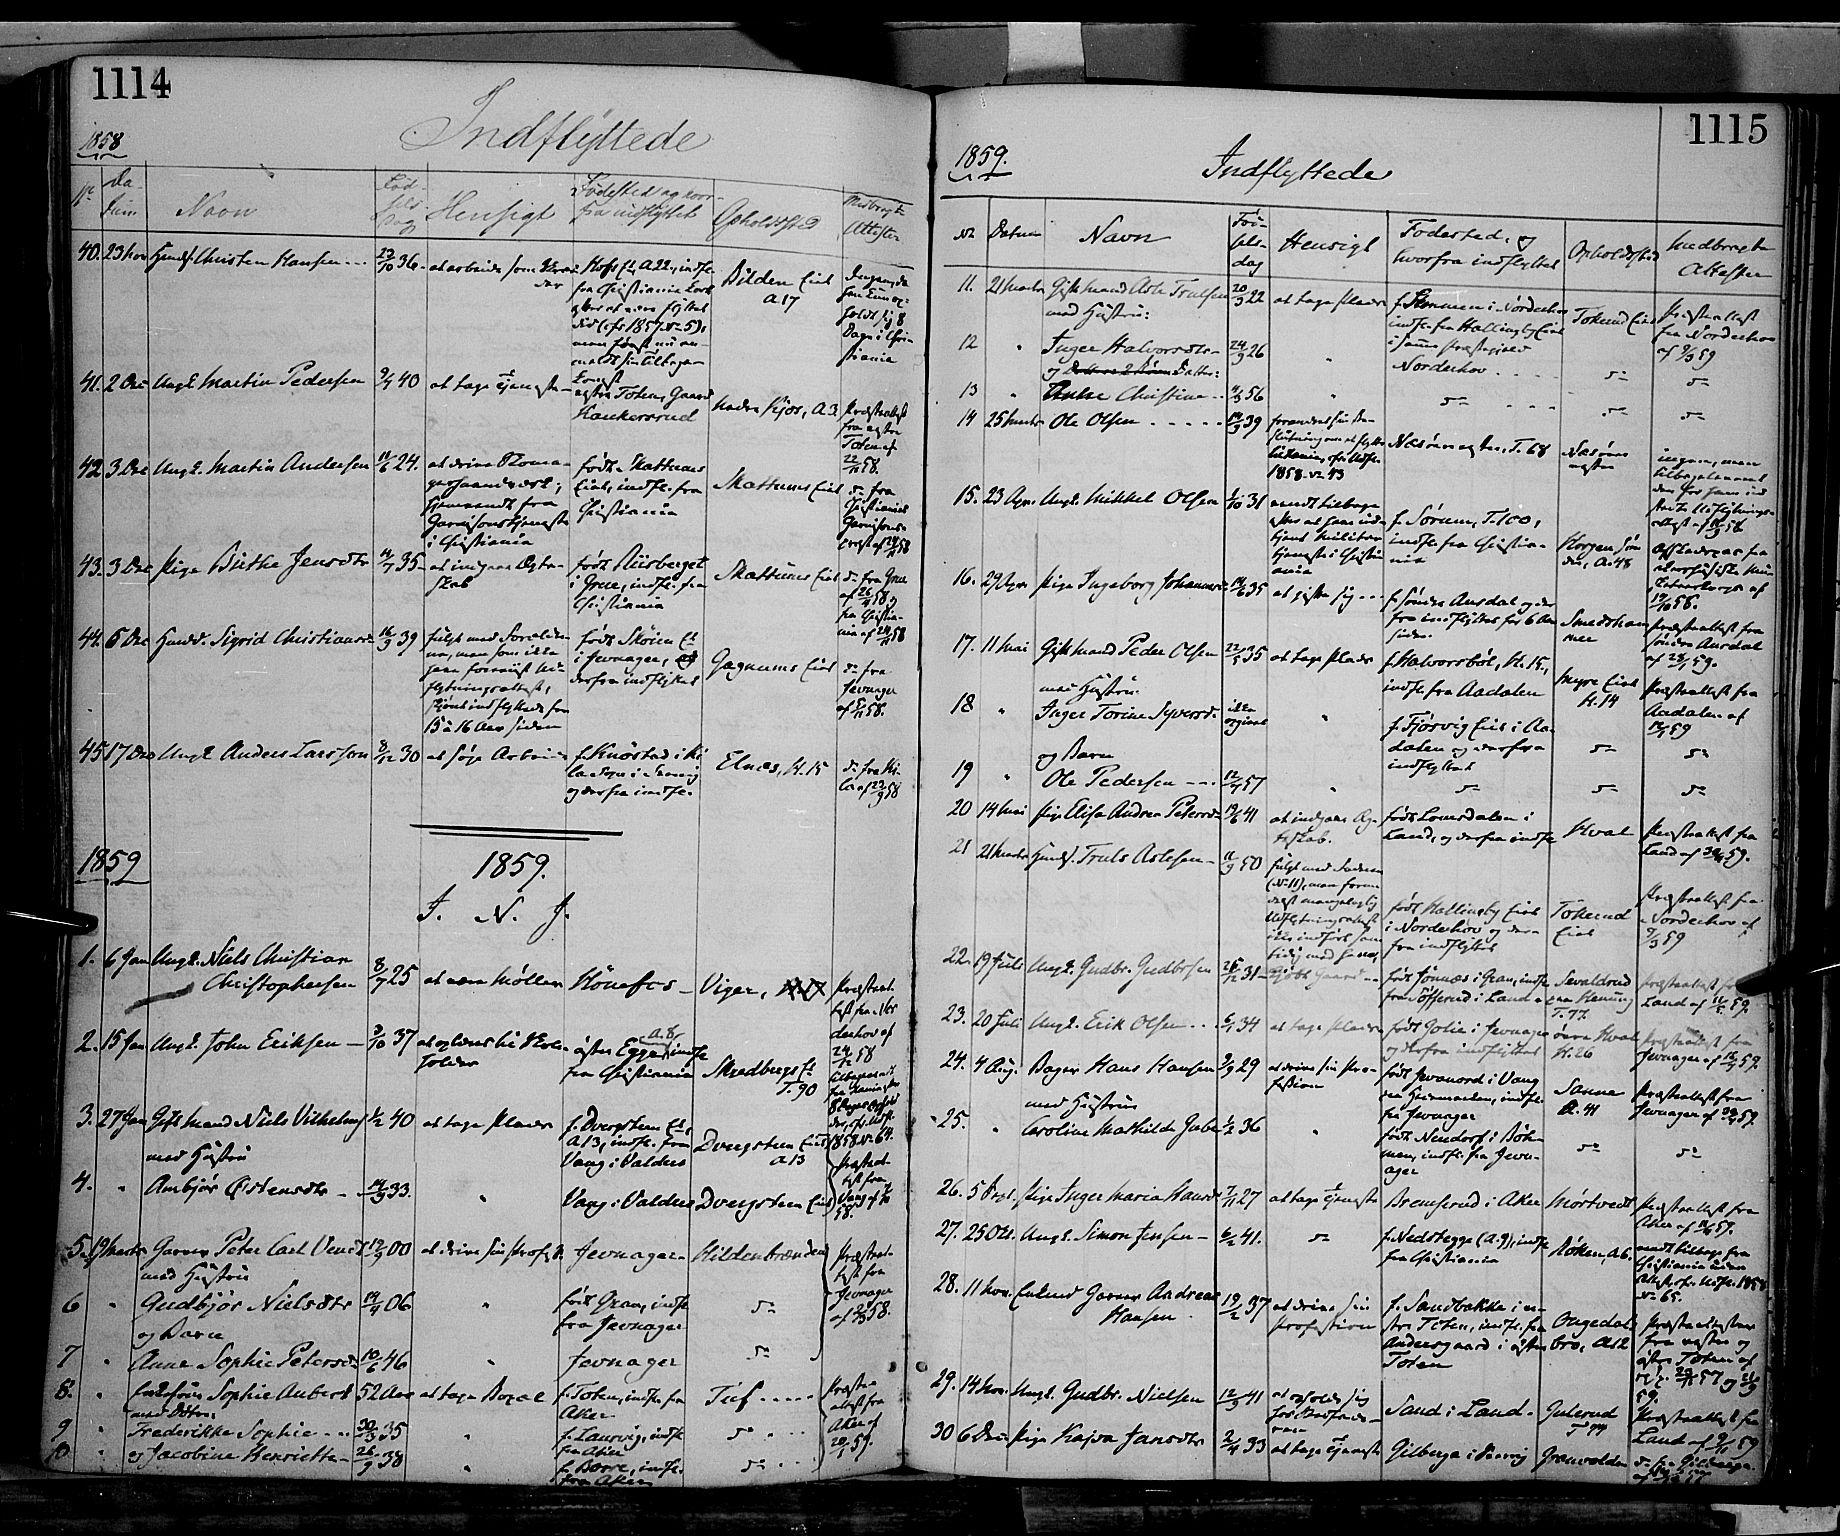 SAH, Gran prestekontor, Ministerialbok nr. 12, 1856-1874, s. 1114-1115